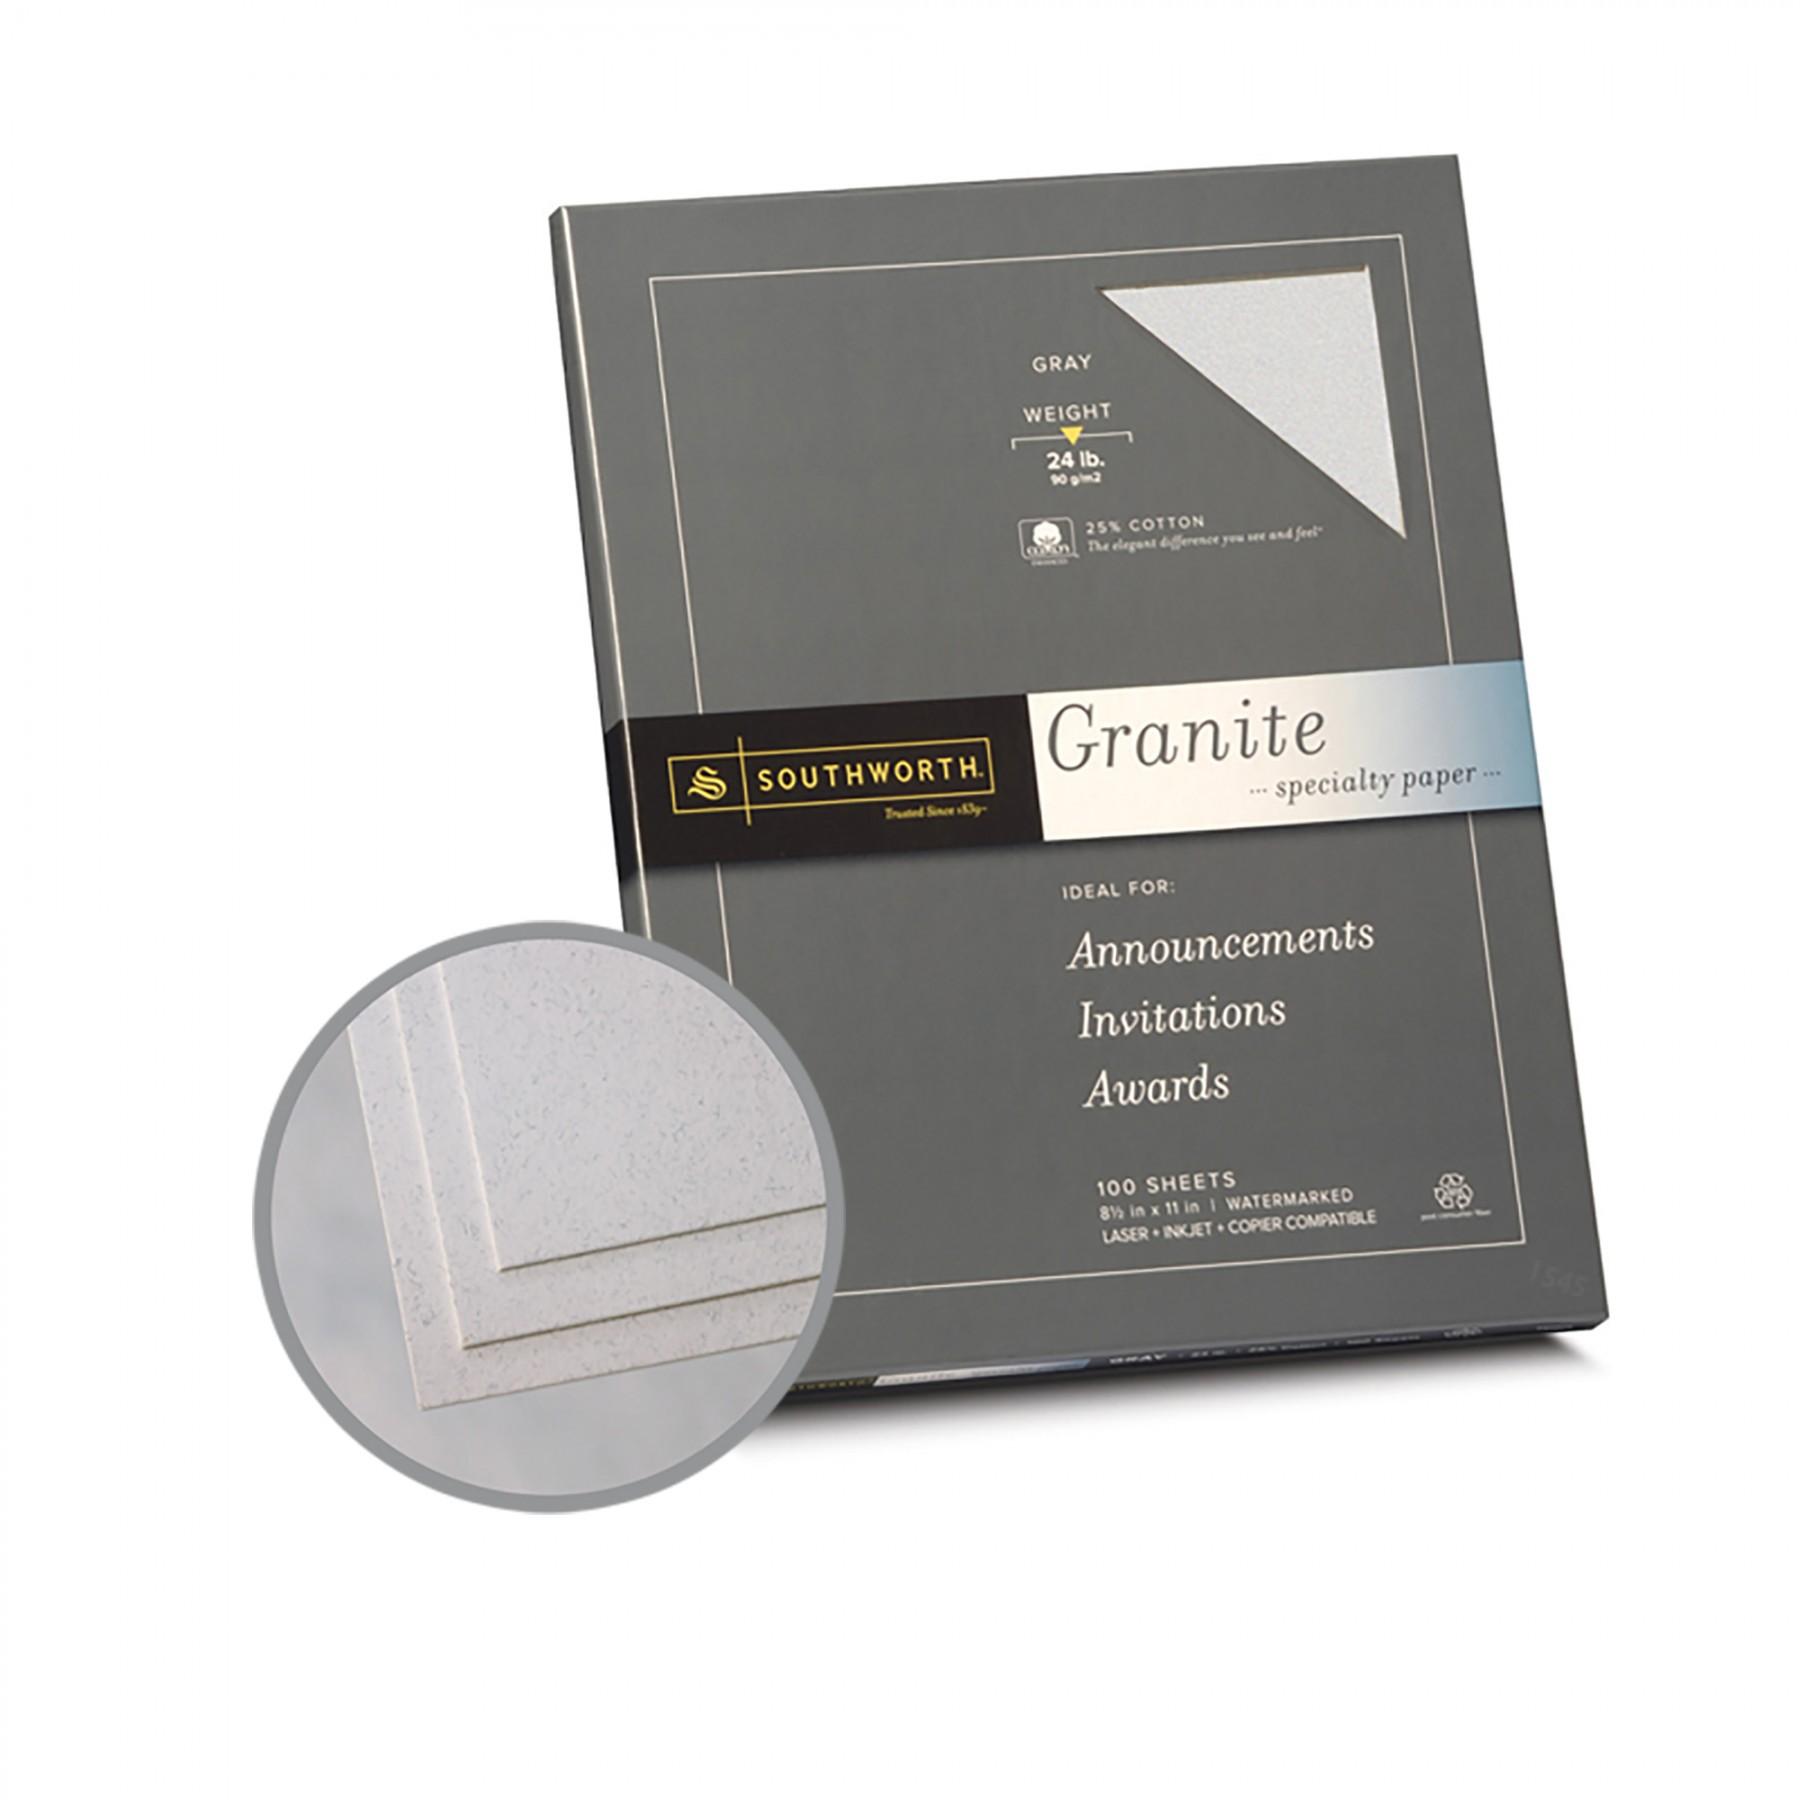 Gray Paper 8 1 2 X 11 In 24 Lb Bond Granite 50 Recycled